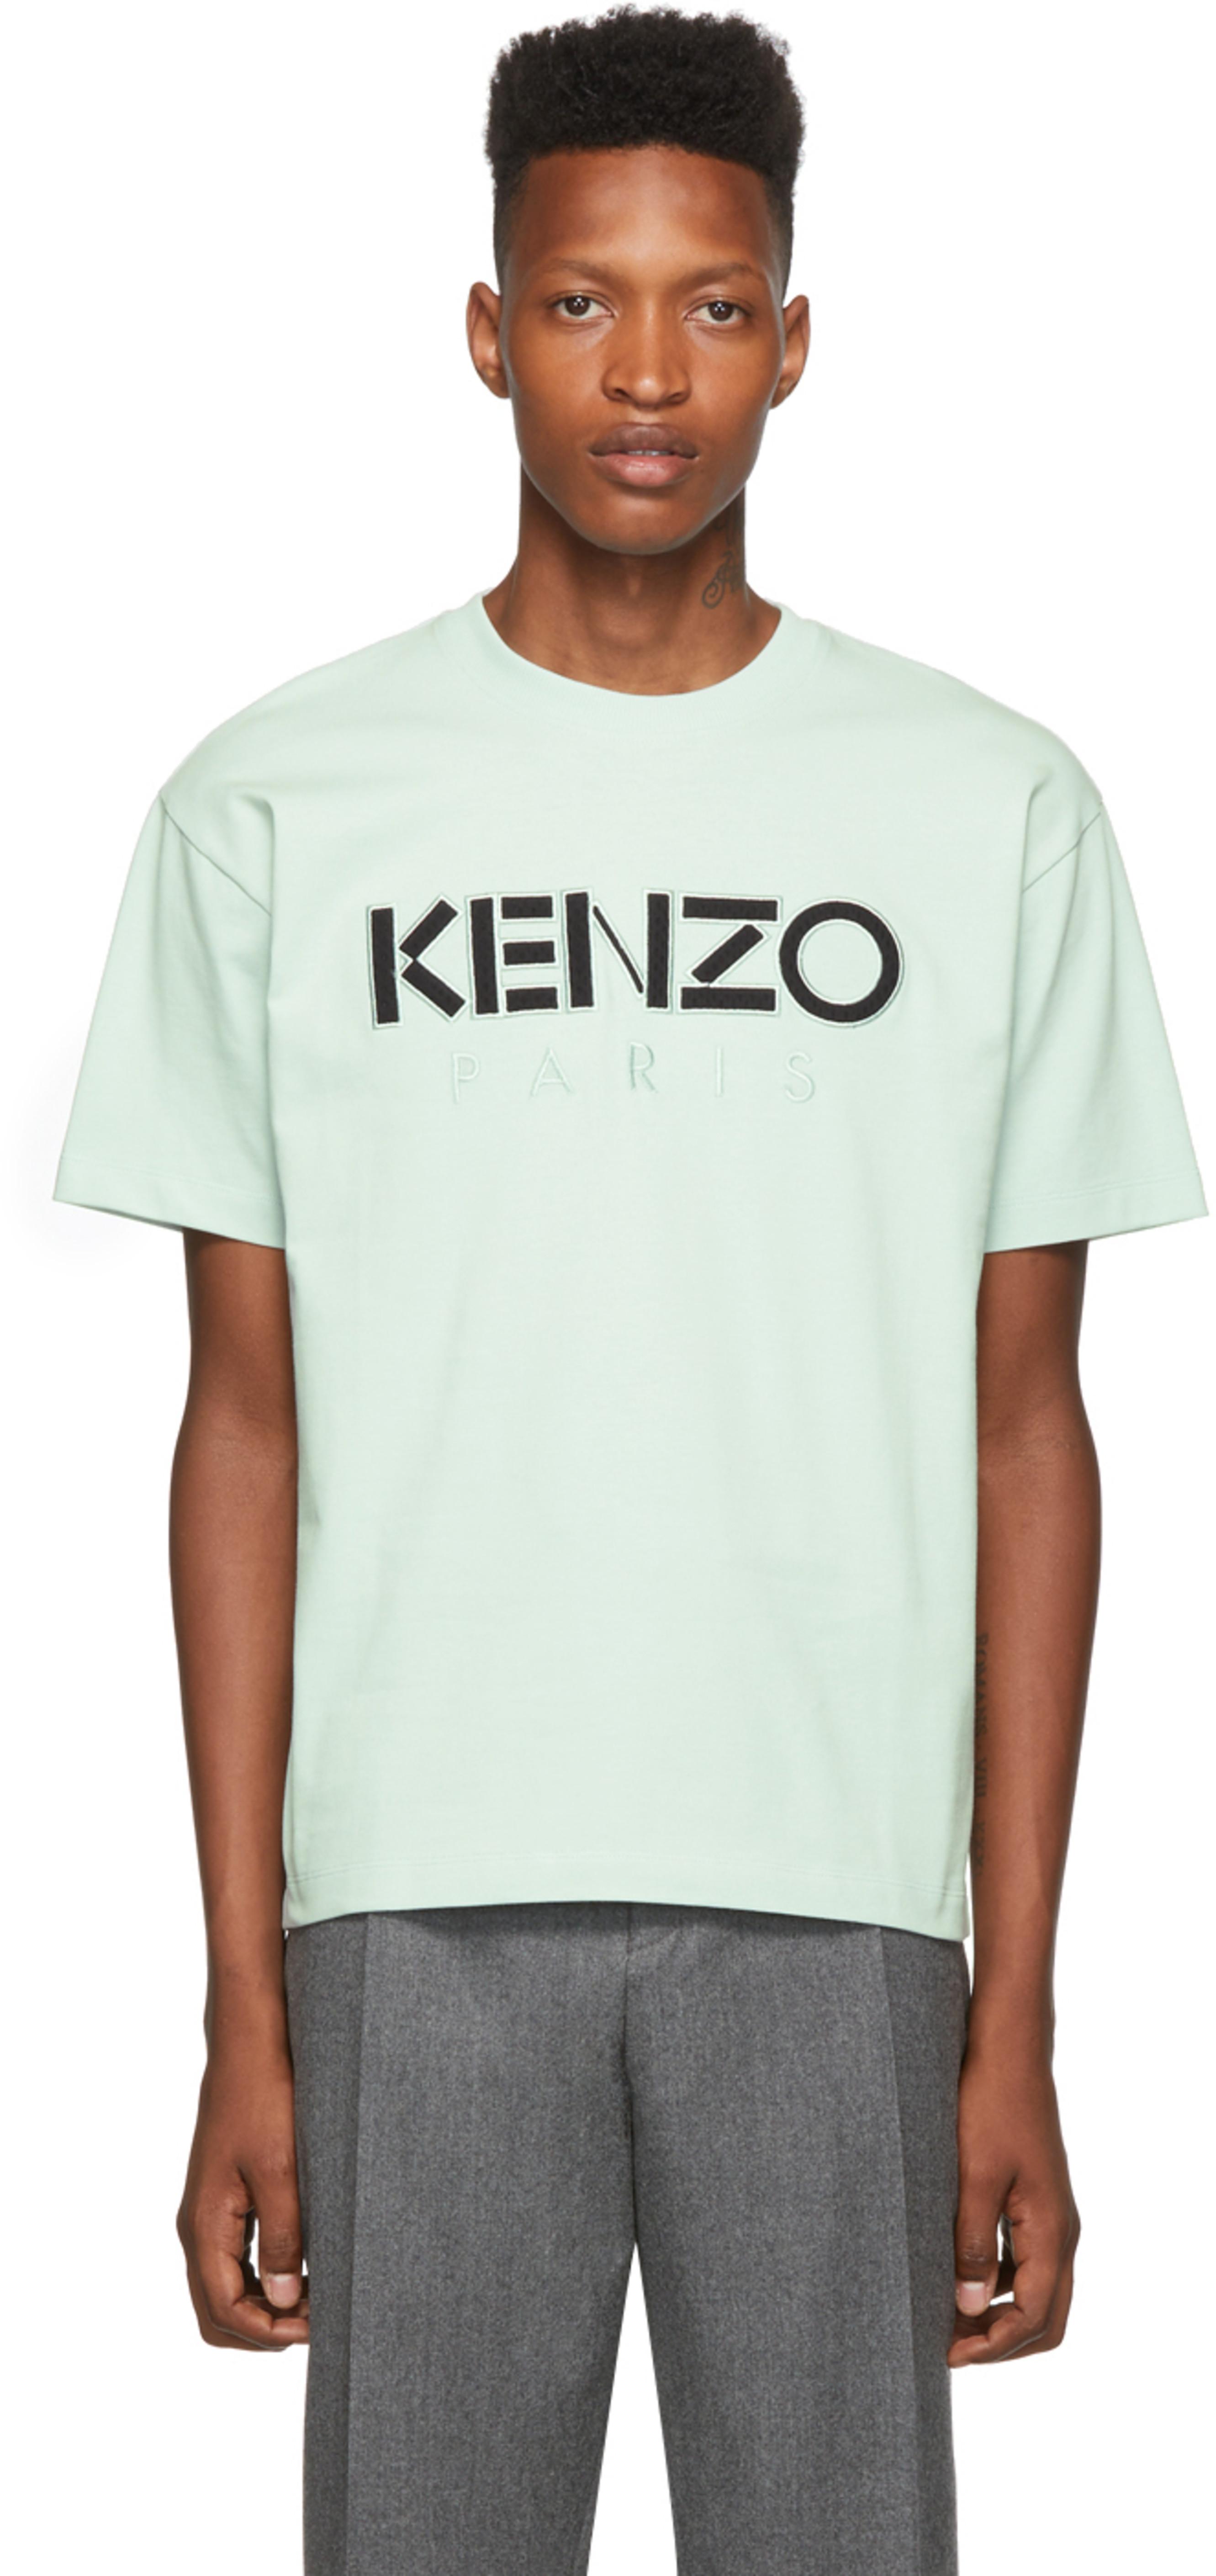 6d2848c0e451 Kenzo for Men FW19 Collection | SSENSE